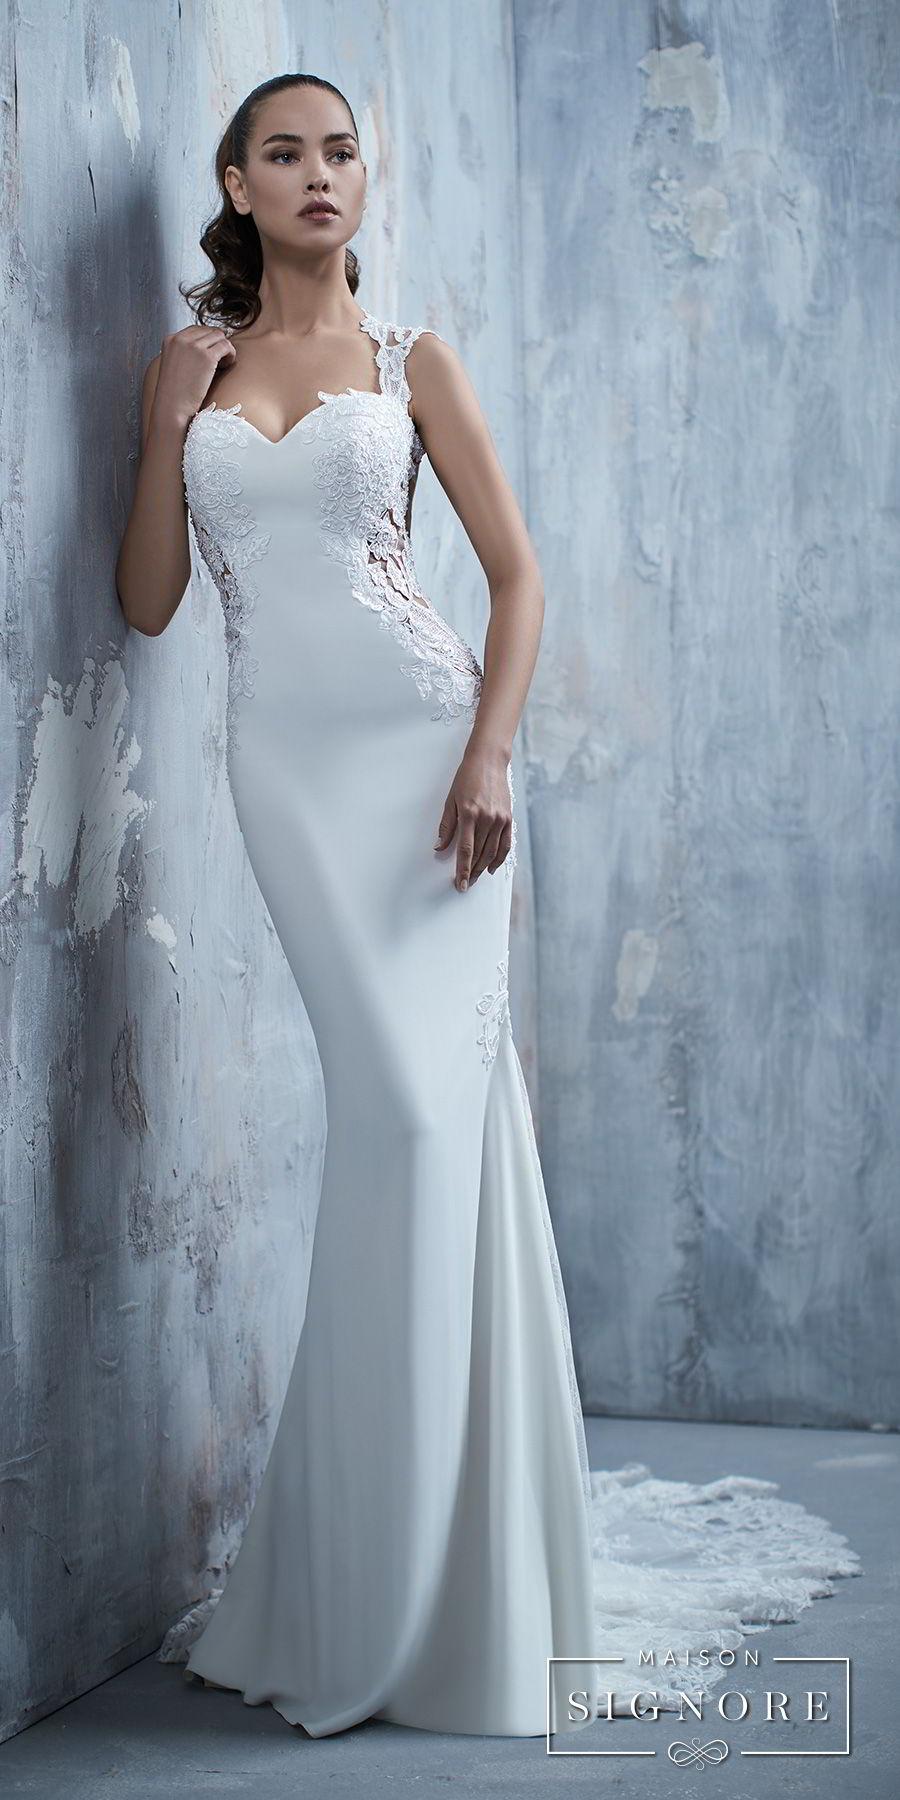 maison signore 2017 bridal cap sleeves sweetheart neckline heavily embellished bodice elegant simple fit and flare sheath wedding dress chapel train (tamiko) mv